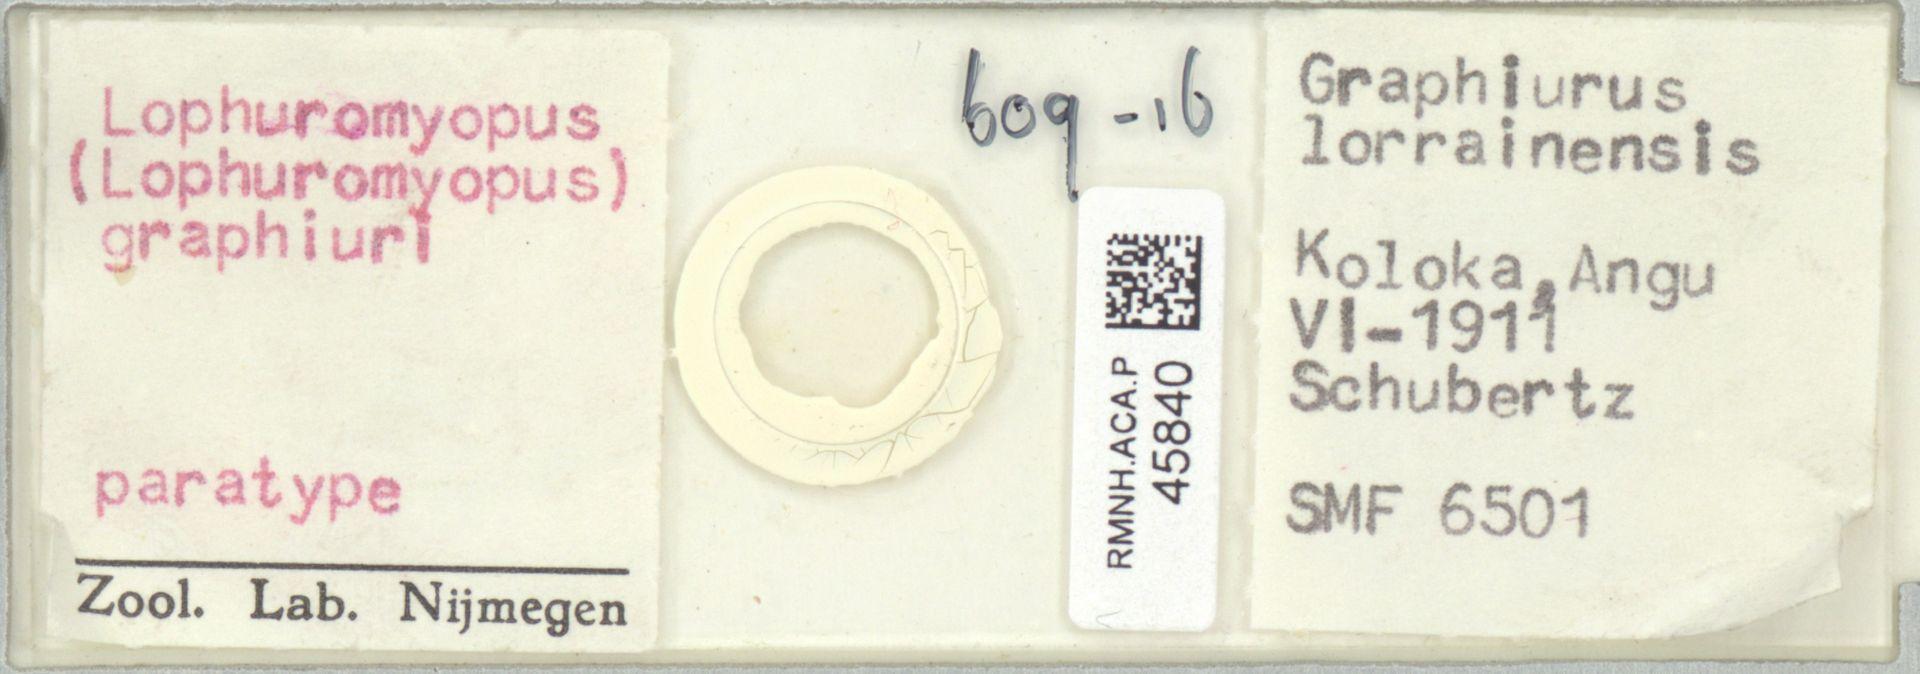 RMNH.ACA.P.45840   Lophuromyopus (Lophuromyopus) graphiuri